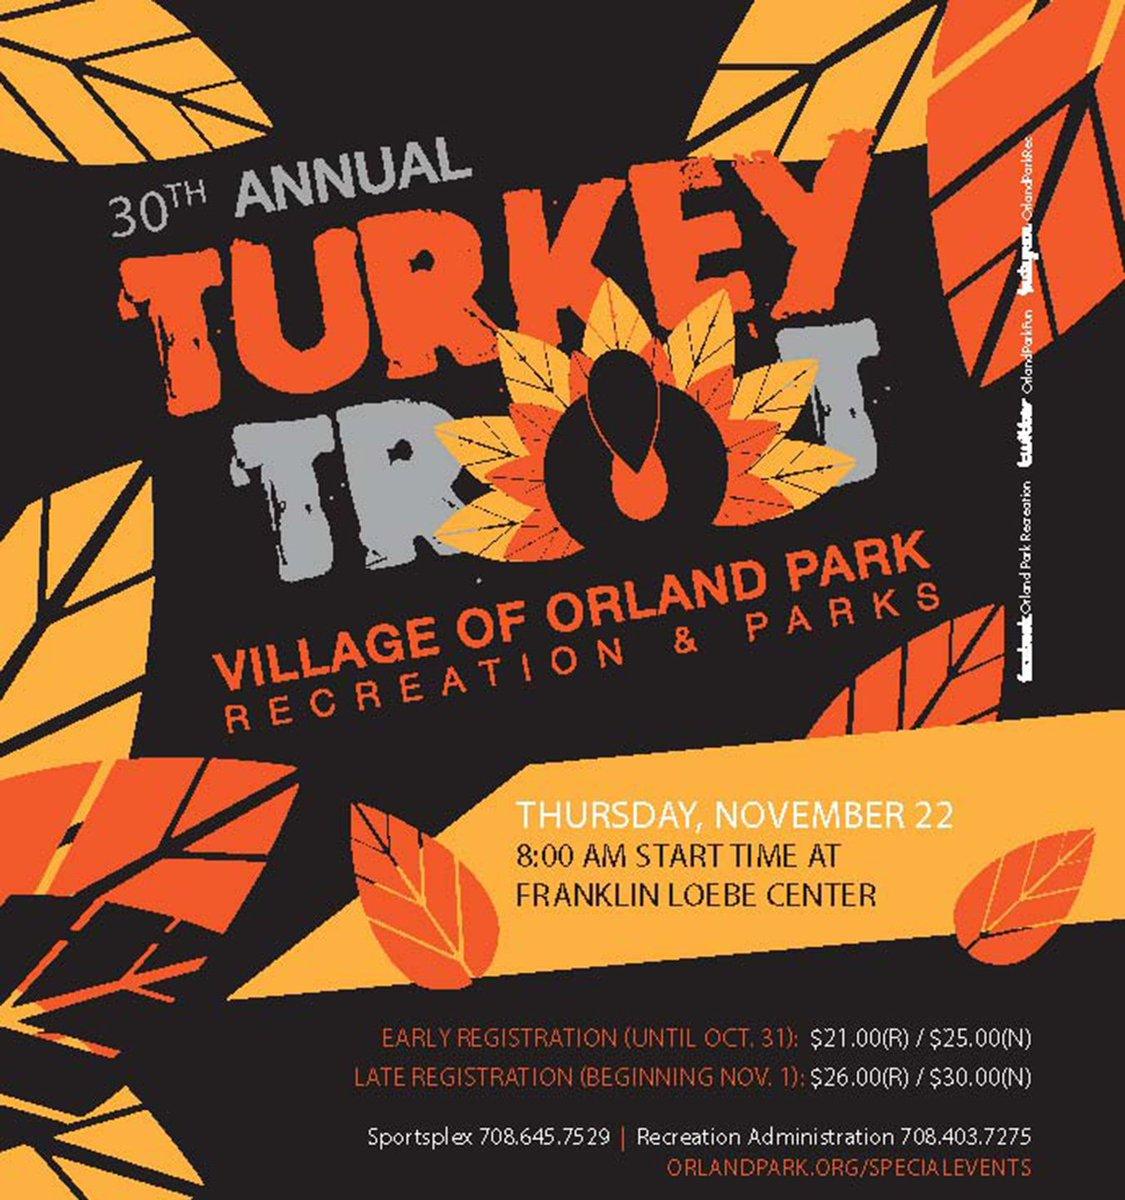 Orland Park Fun on Twitter: